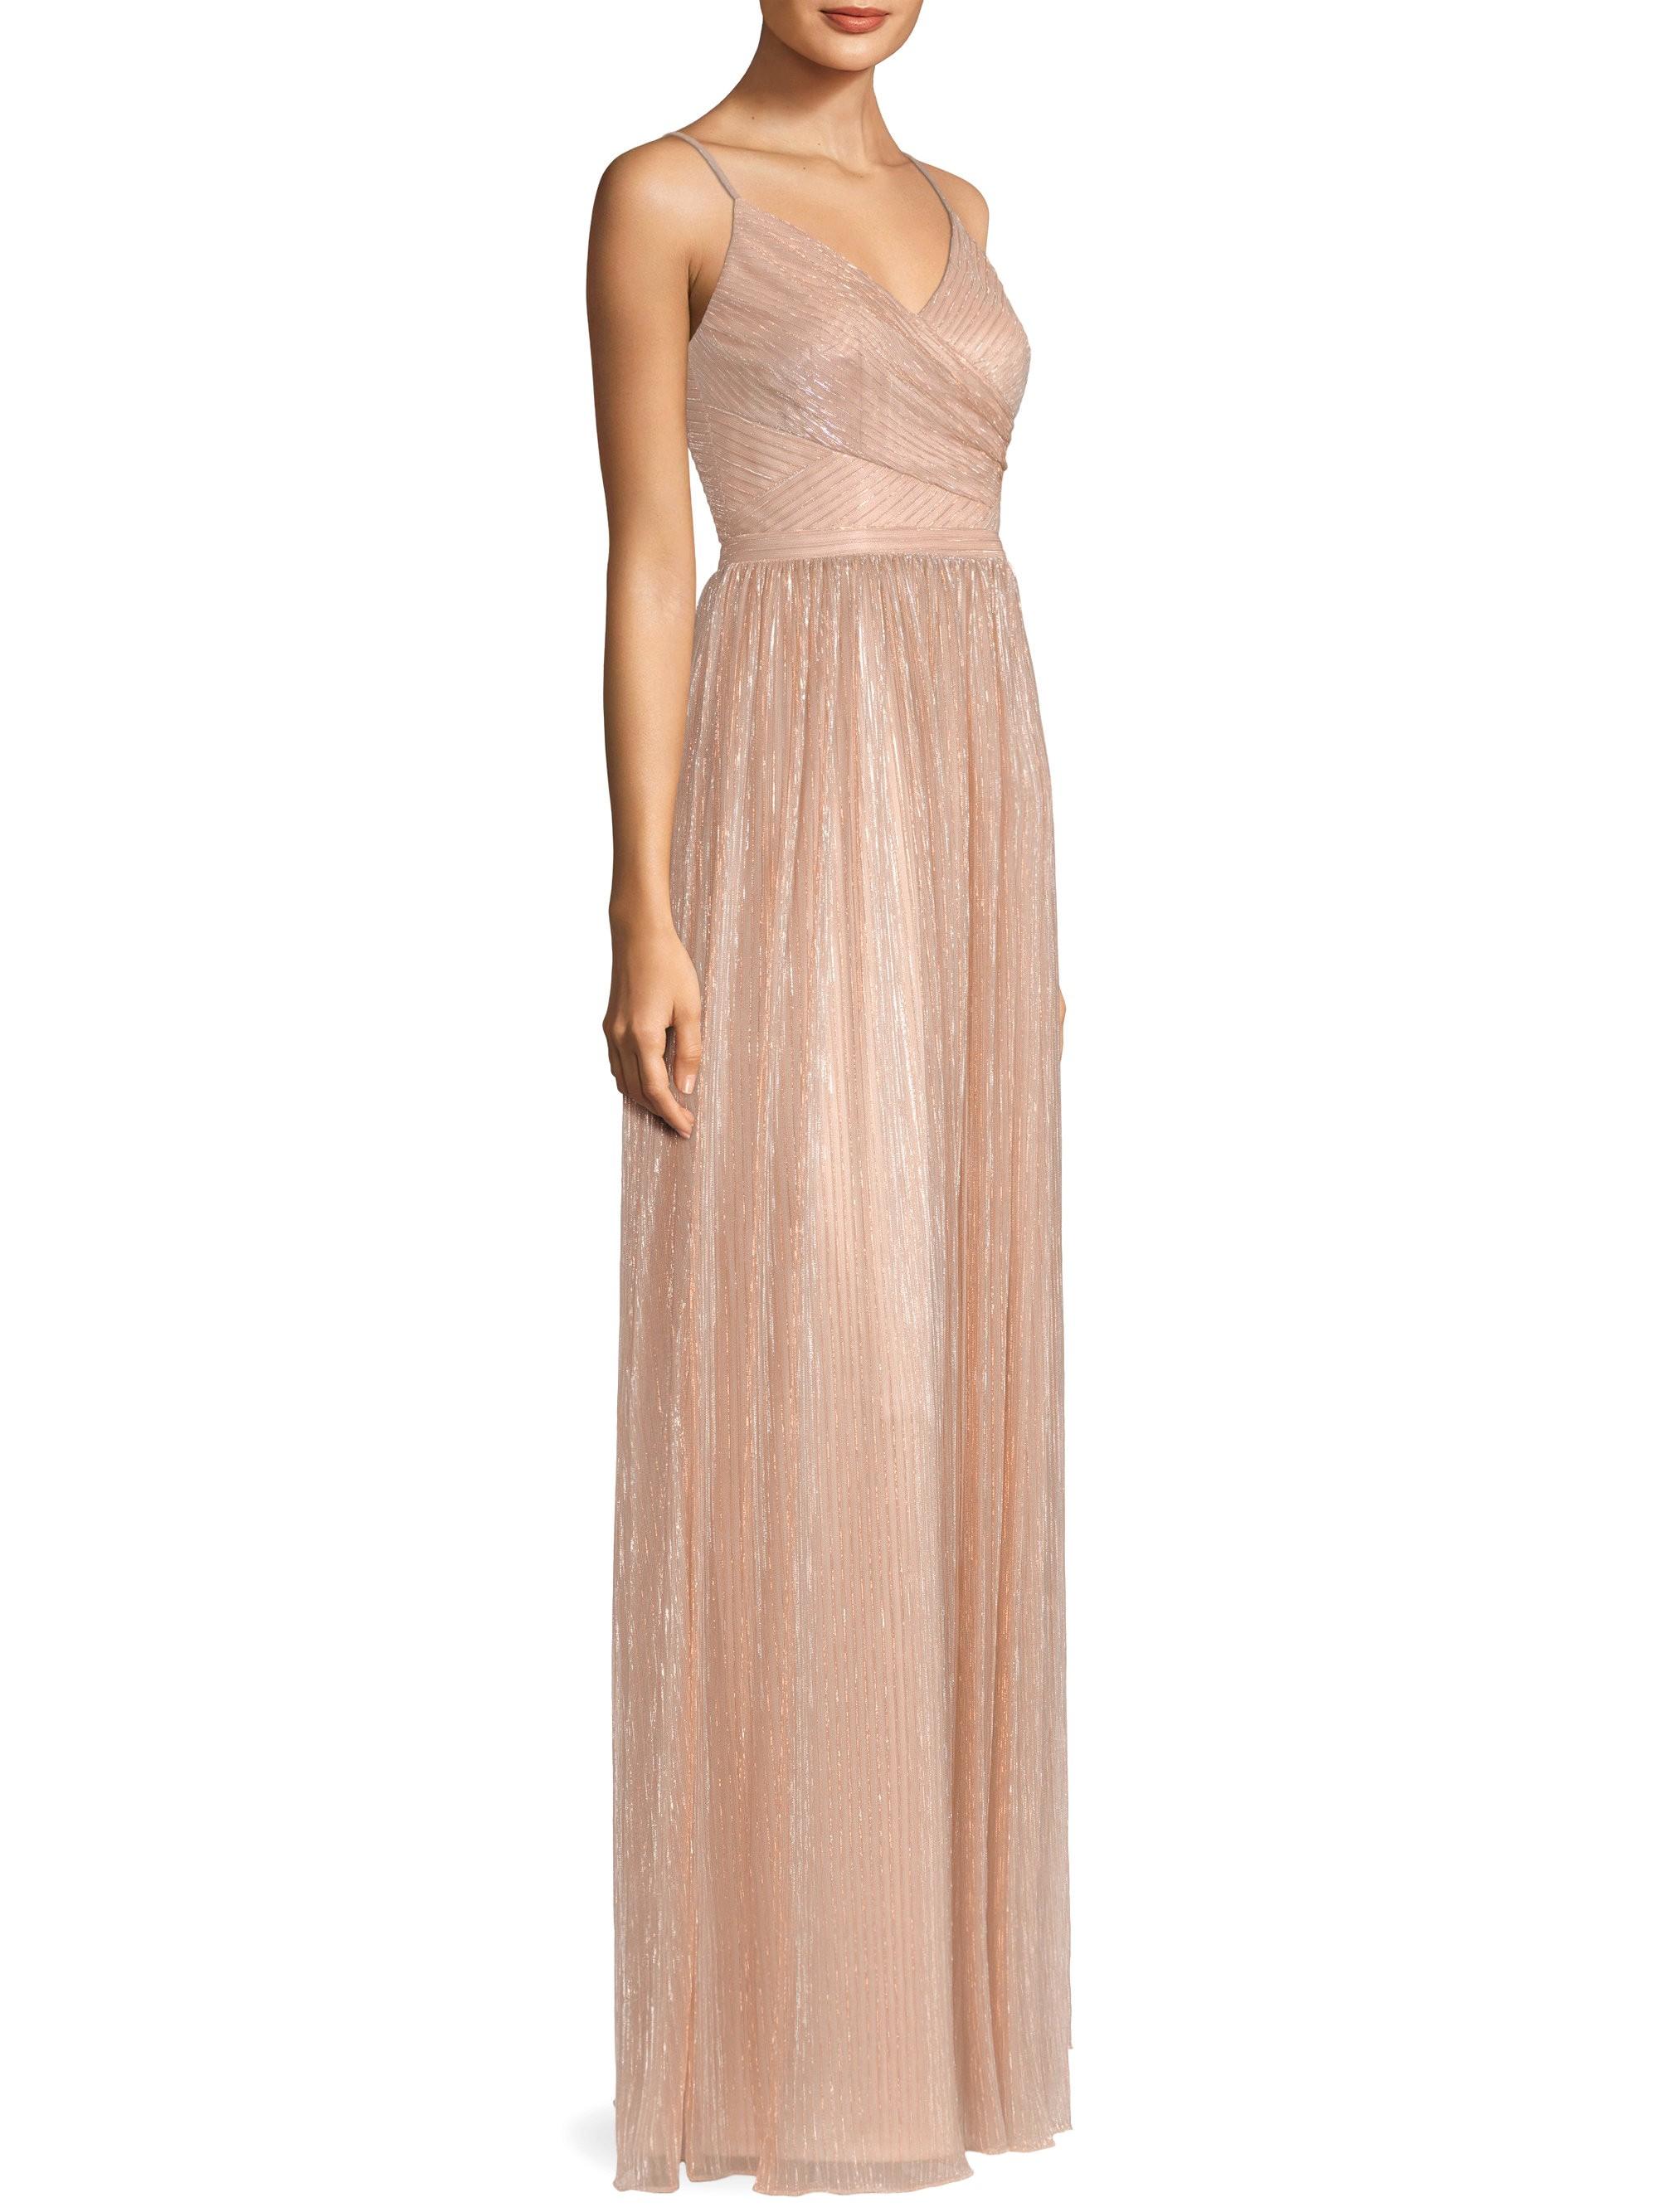 f9afe96d2718e Laundry By Shelli Segal Crisscross Bodice Metallic Dress - Pink Gin ...